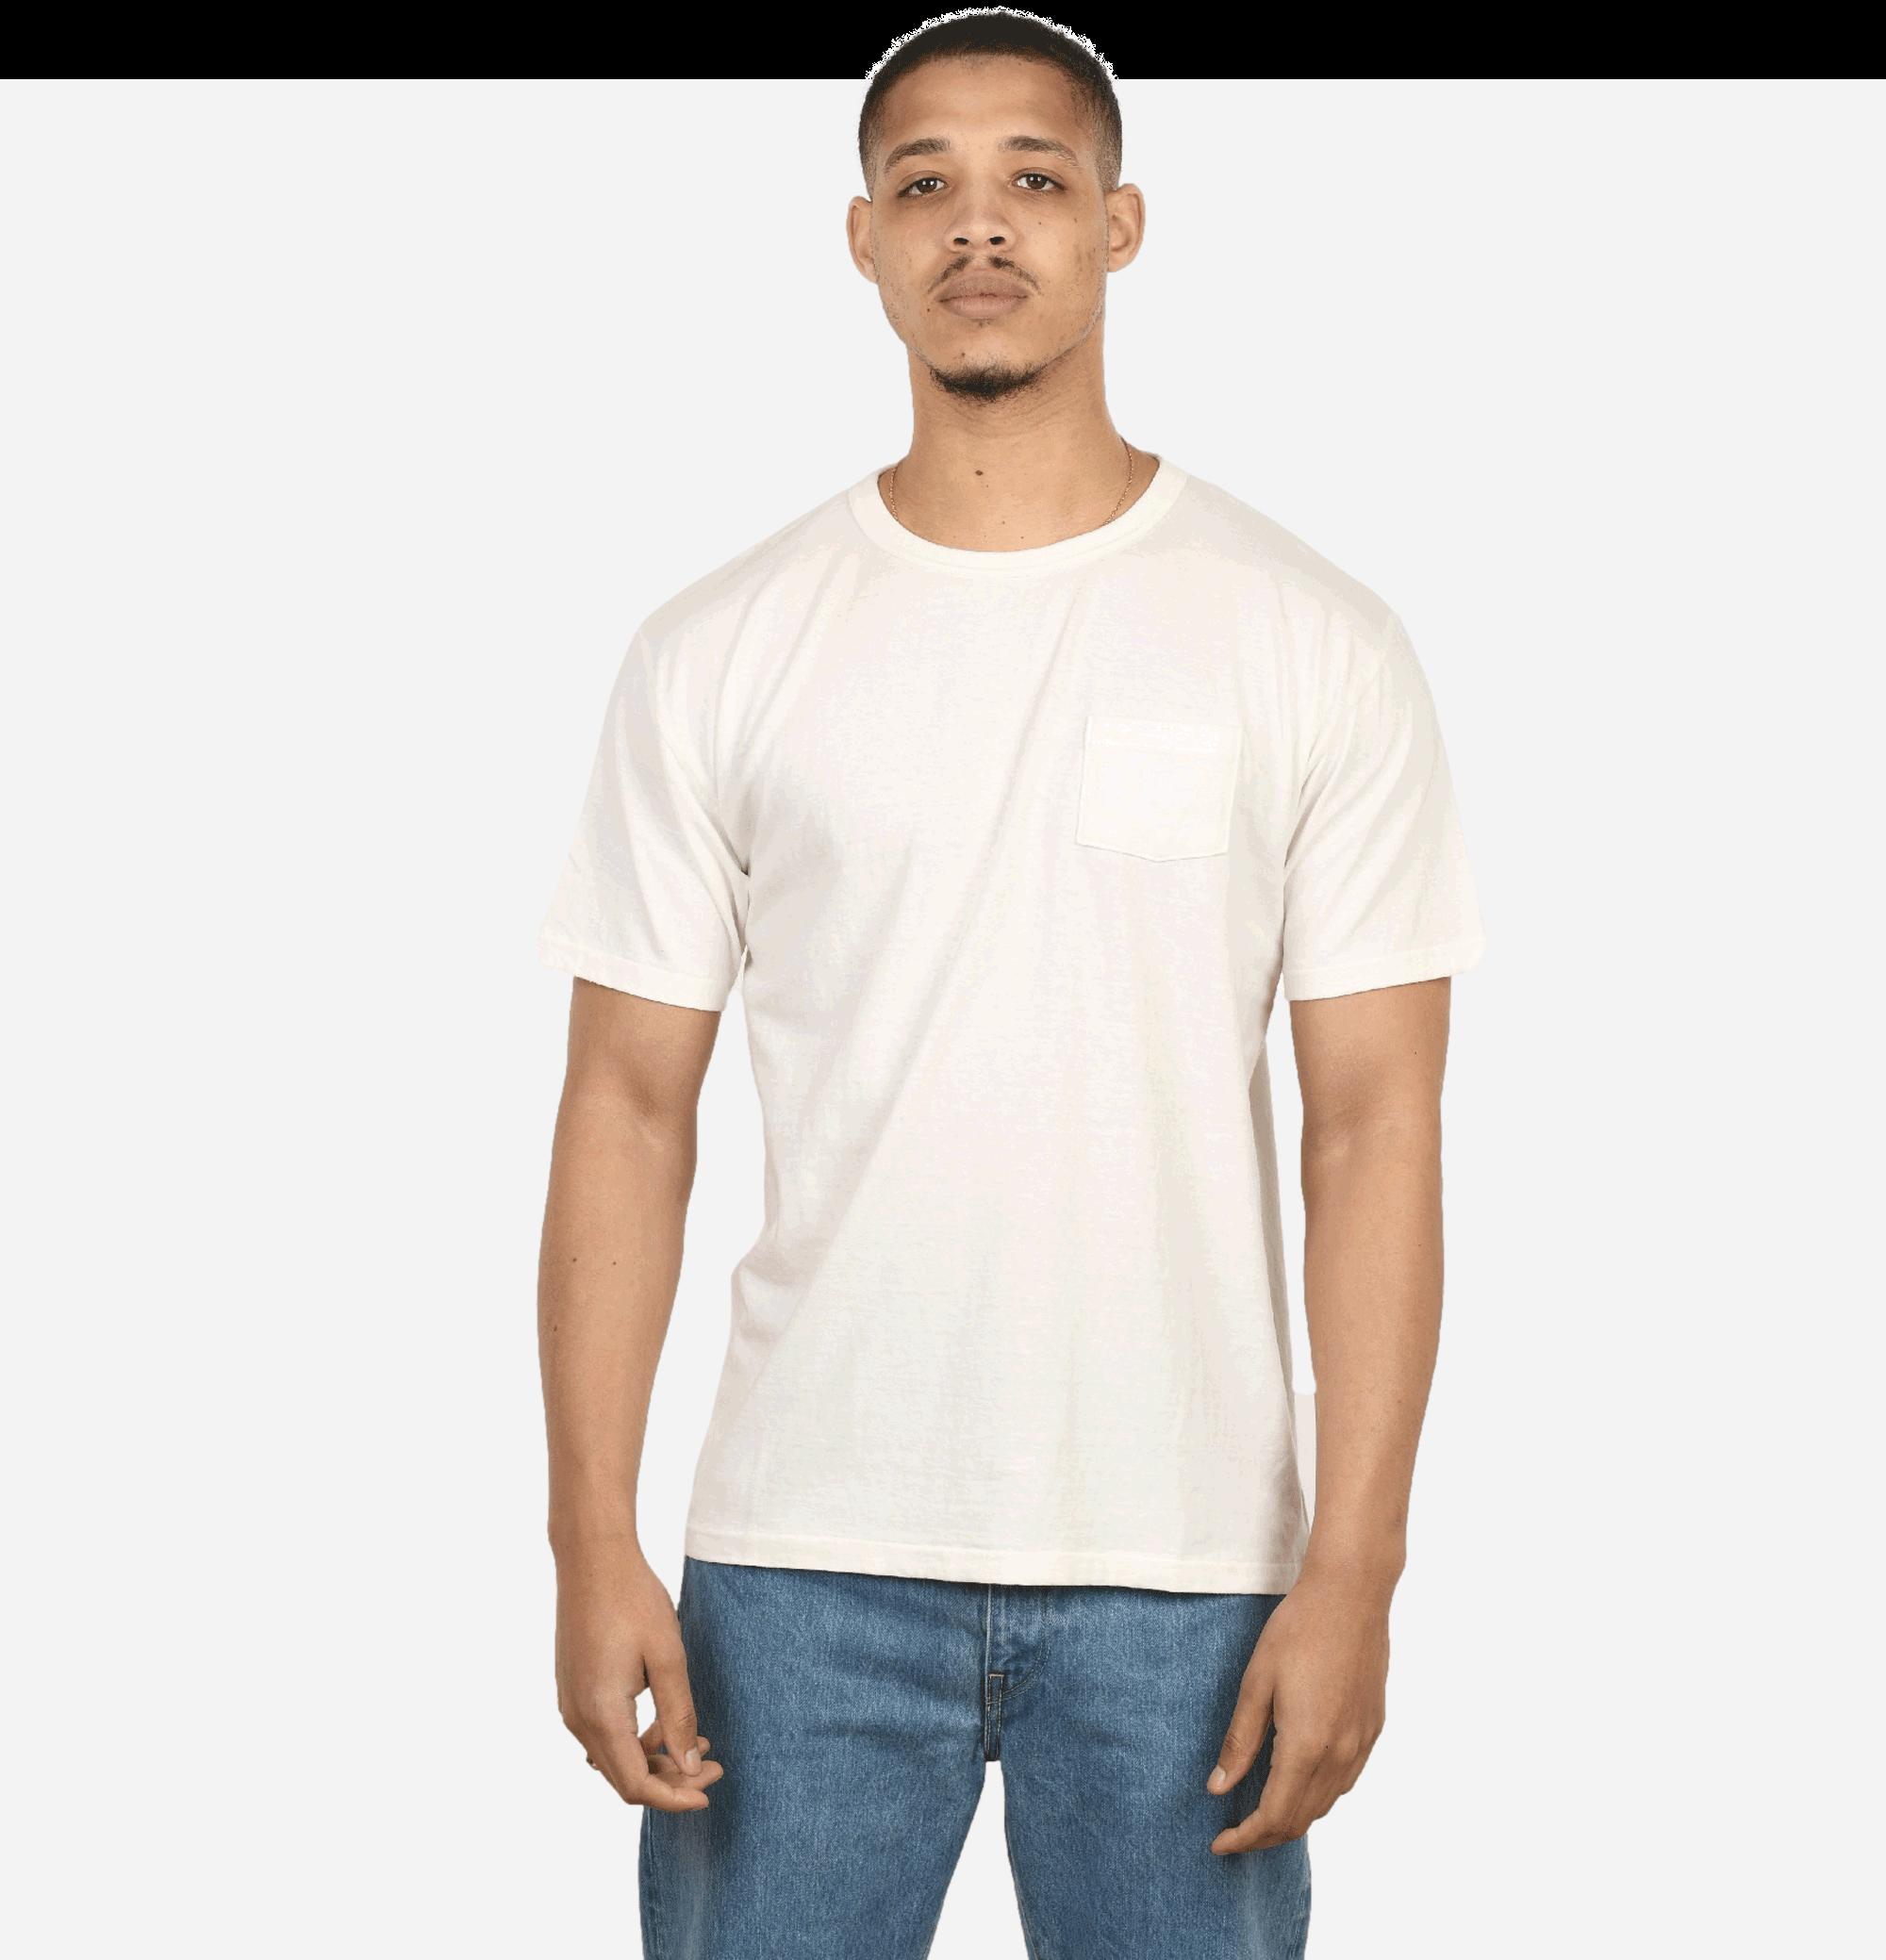 Hanalei T-shirt Off White